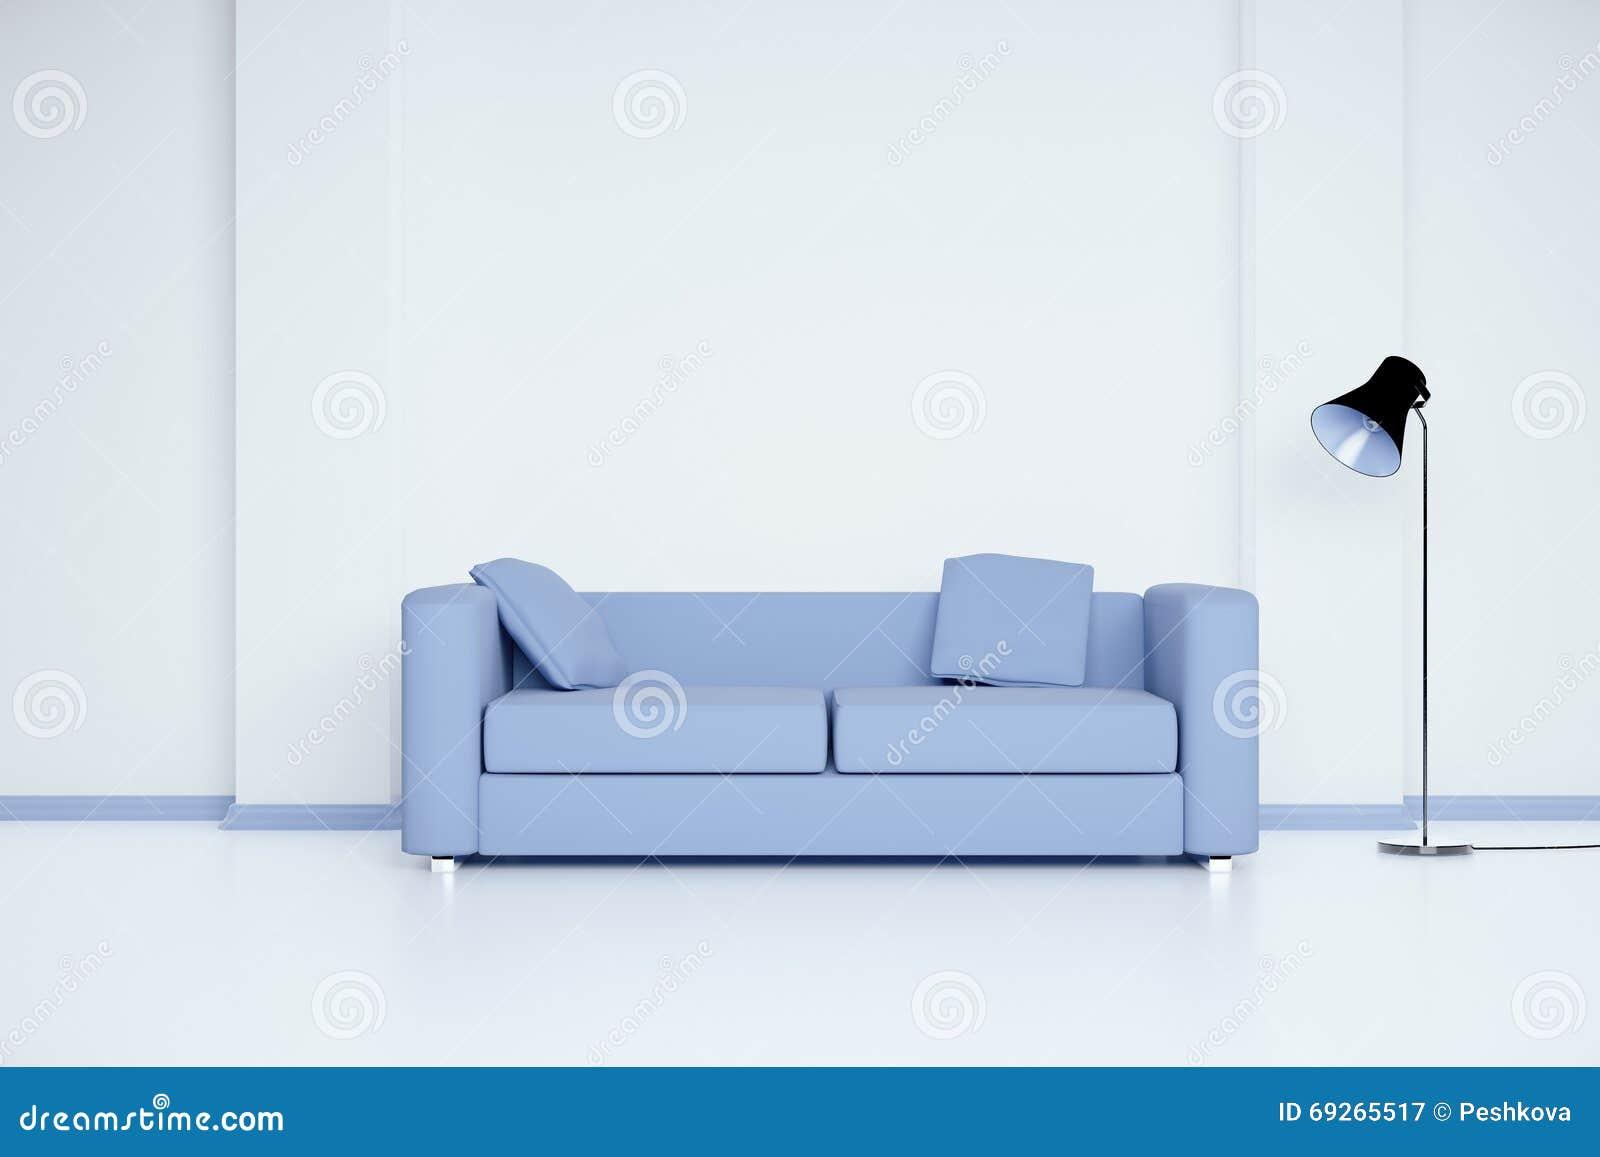 Pleasant Room With Blue Sofa Stock Illustration Illustration Of Machost Co Dining Chair Design Ideas Machostcouk